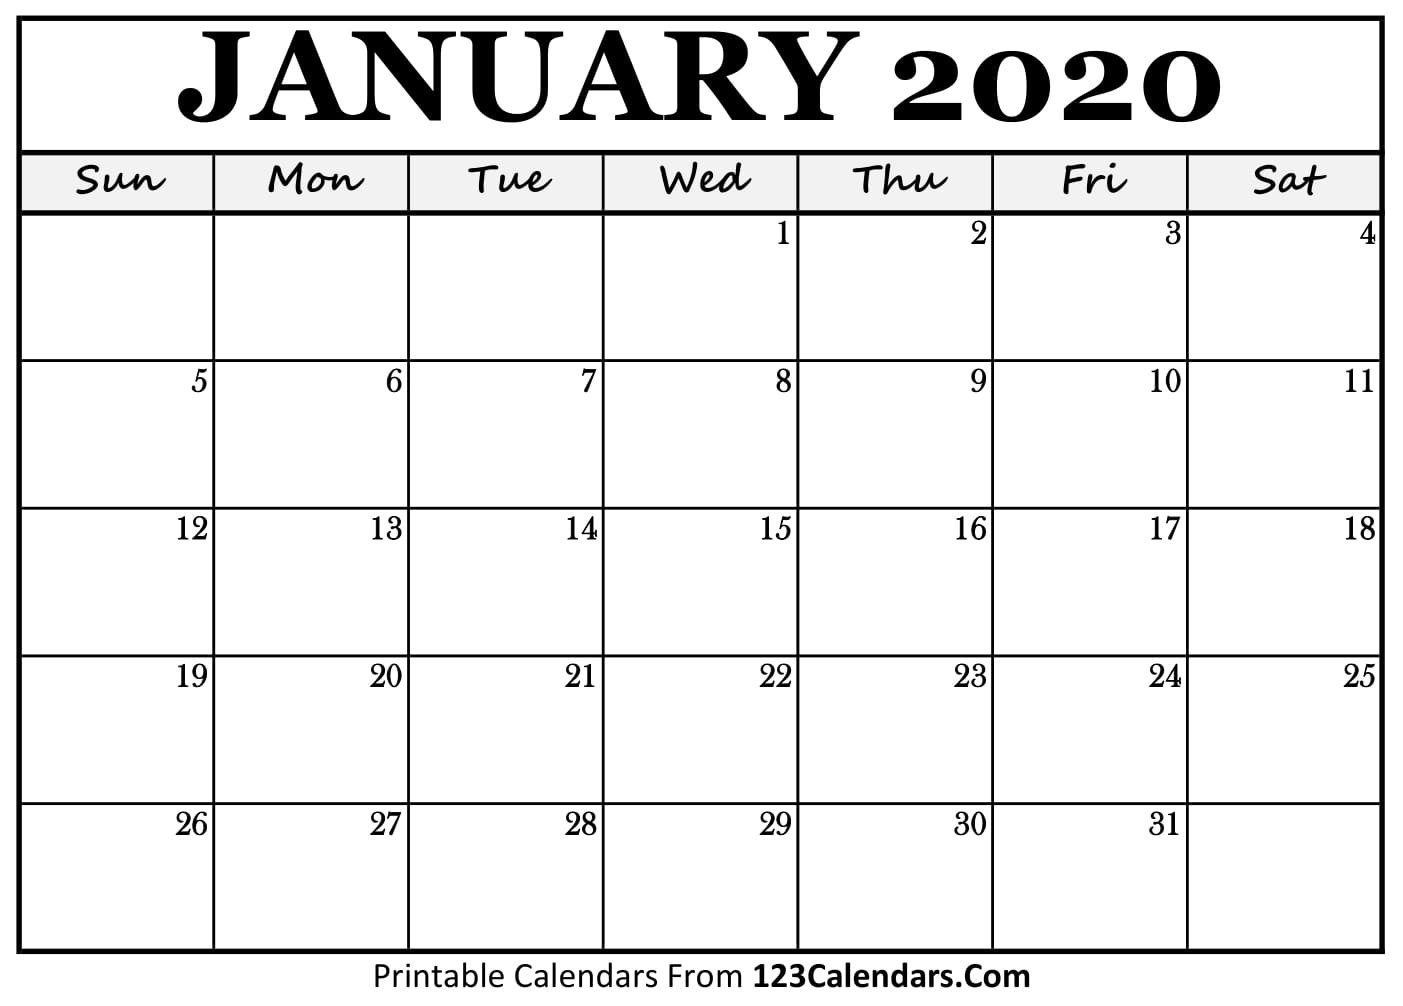 Free Printable Calendar | 123Calendars Free Printable Calendar Fill In